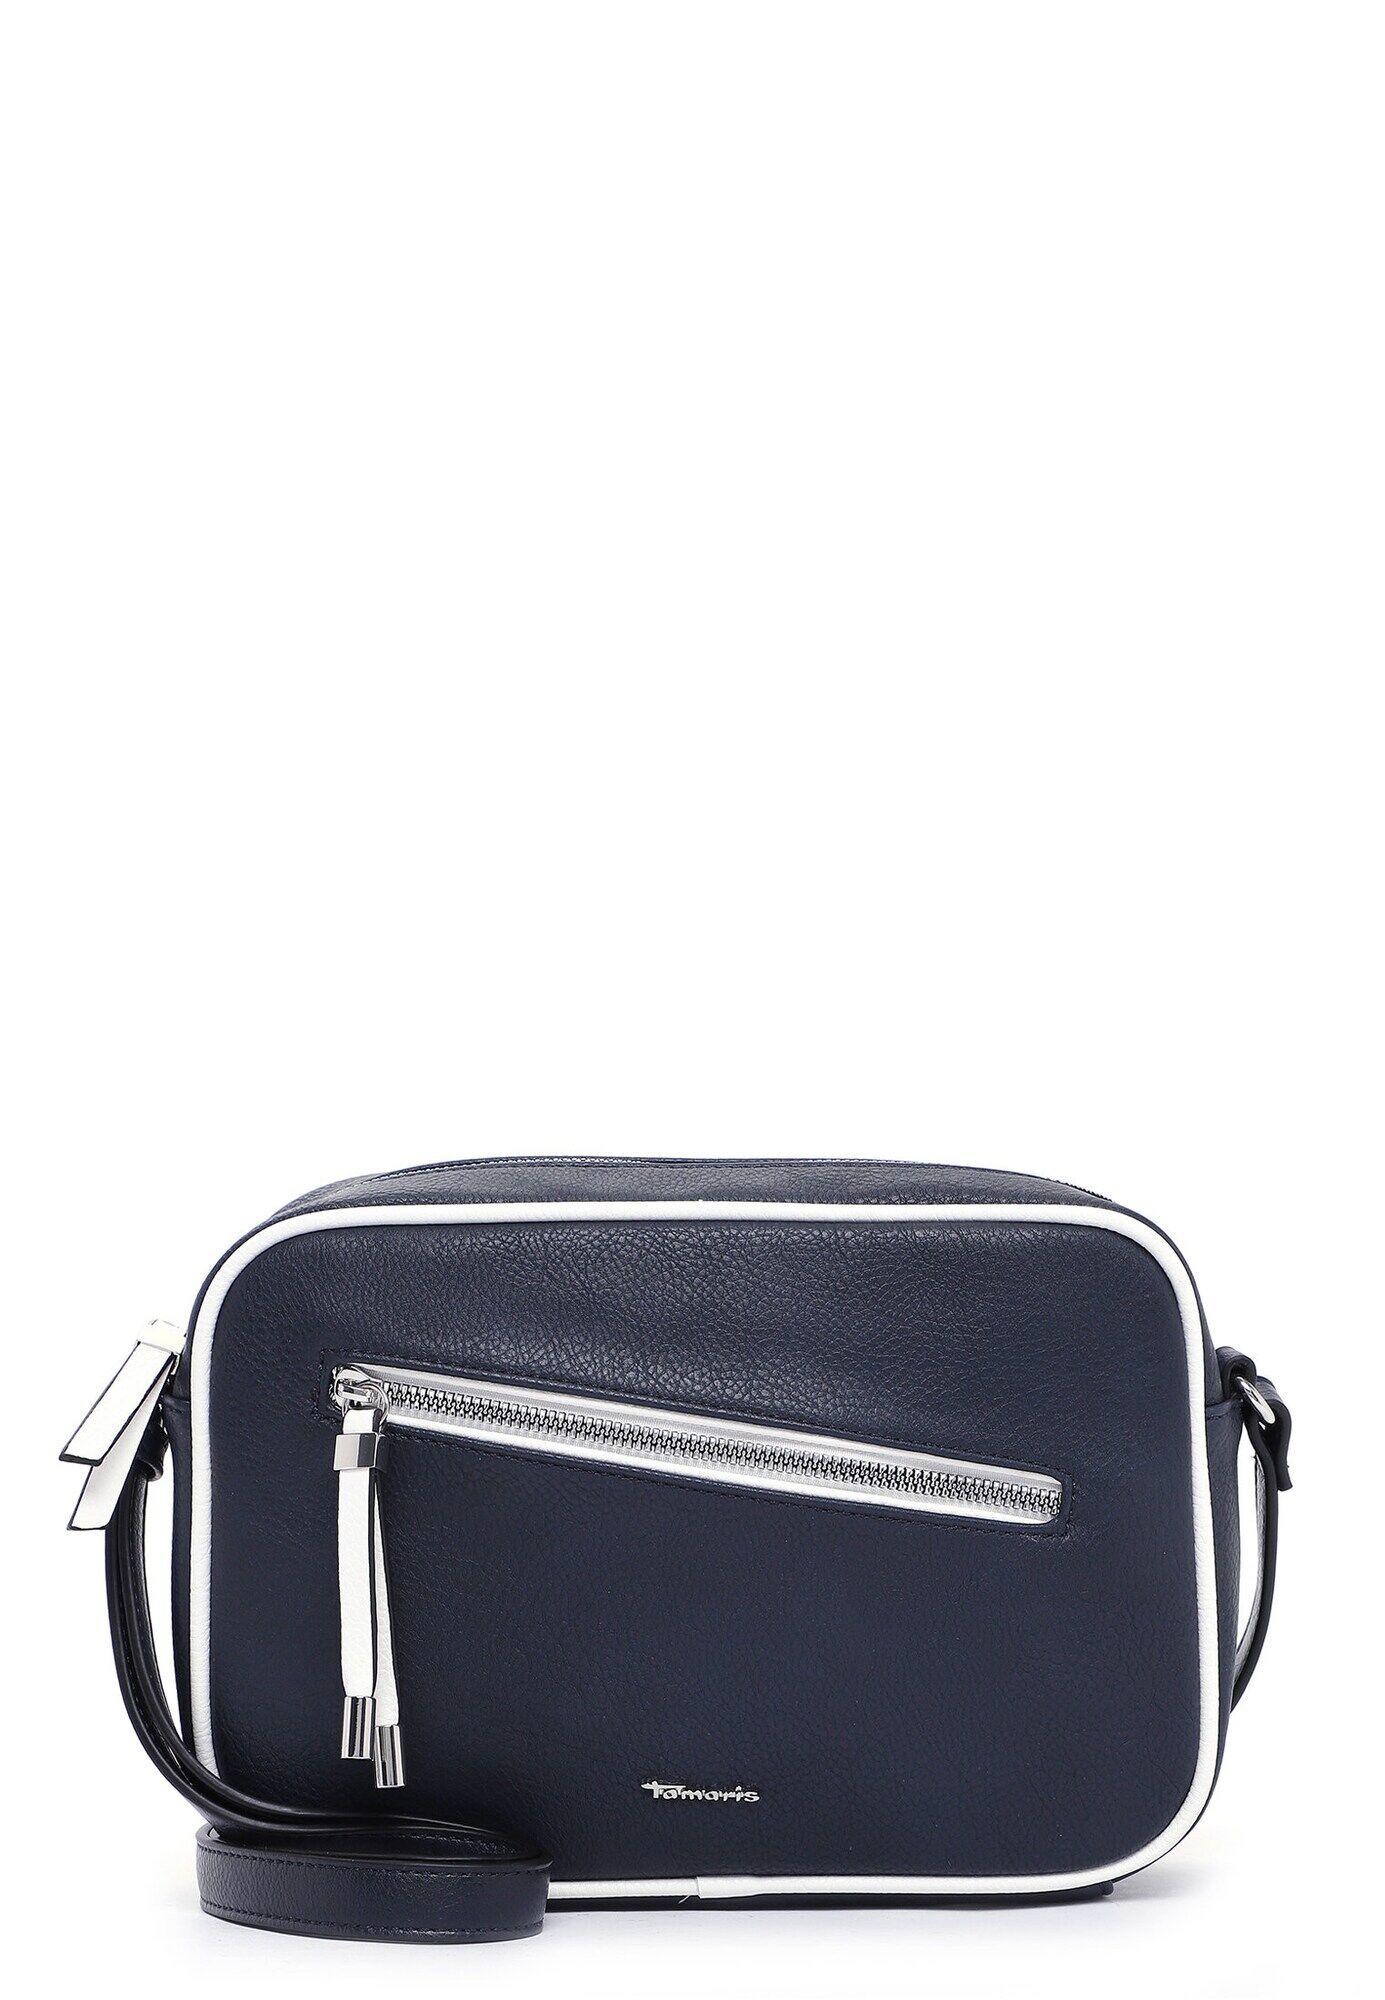 TAMARIS Sac à bandoulière 'Corrina'  - Bleu - Taille: One Size - female